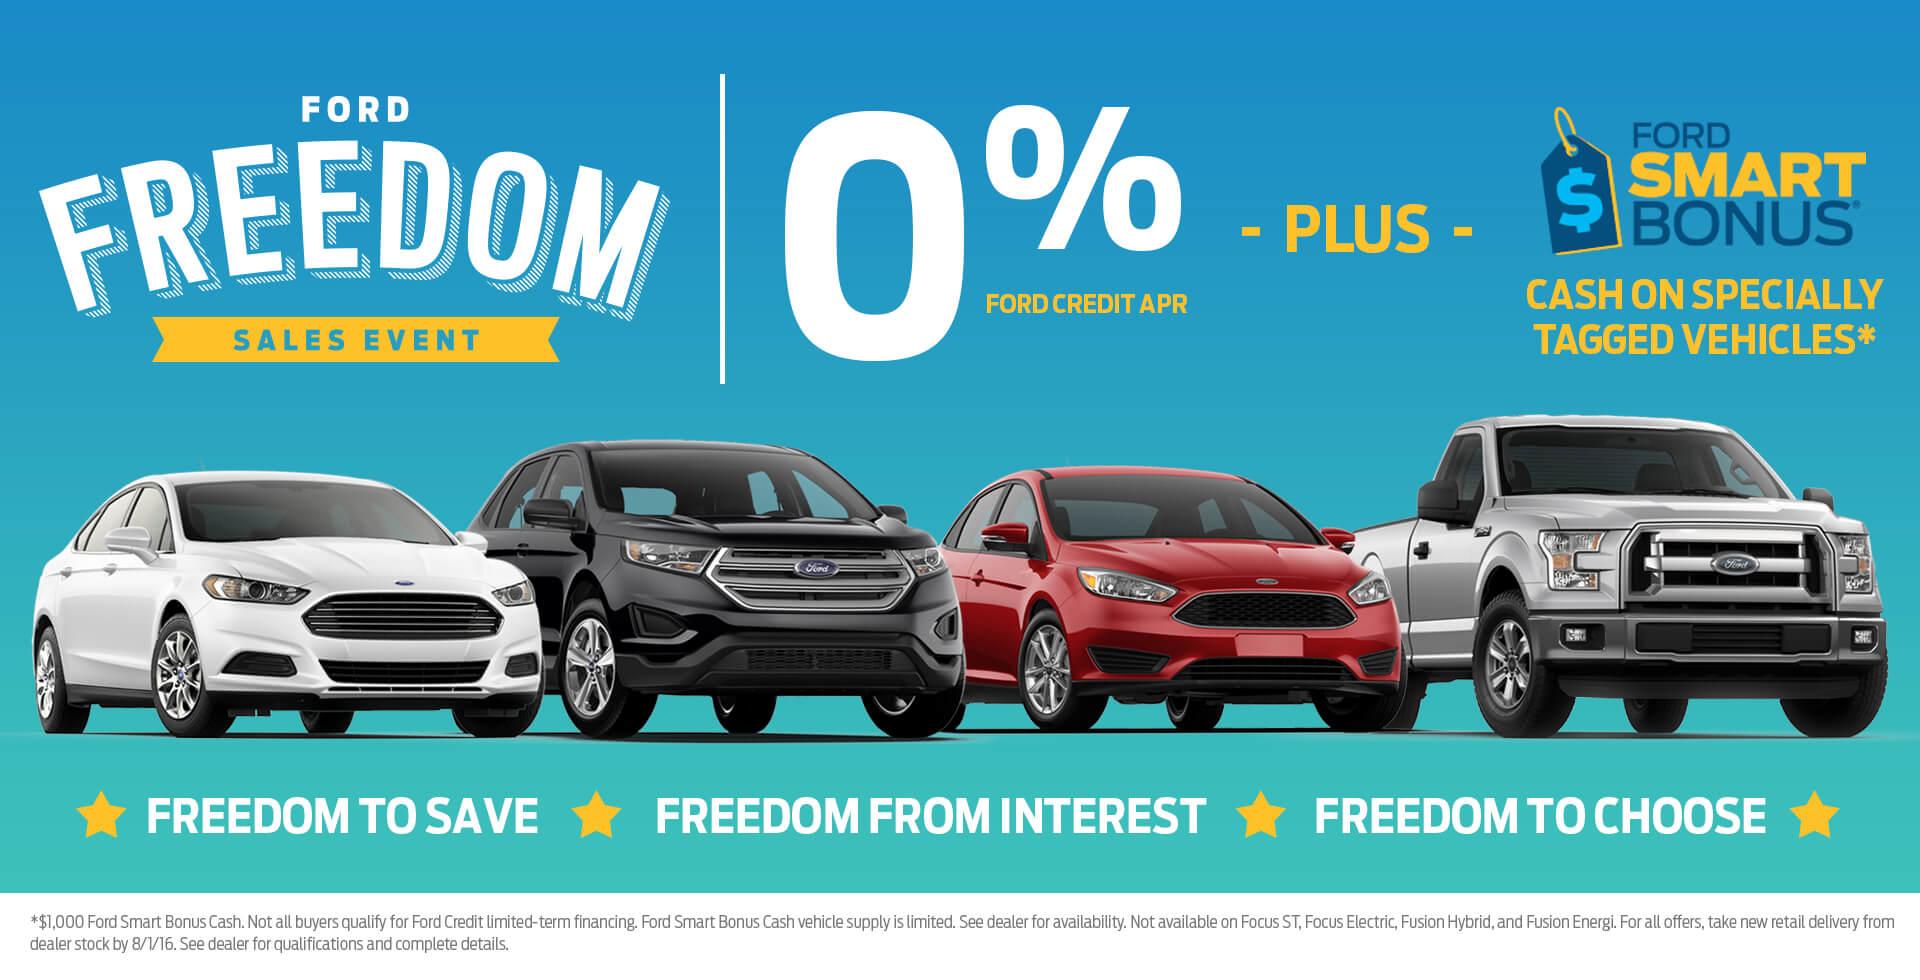 0% Freedom